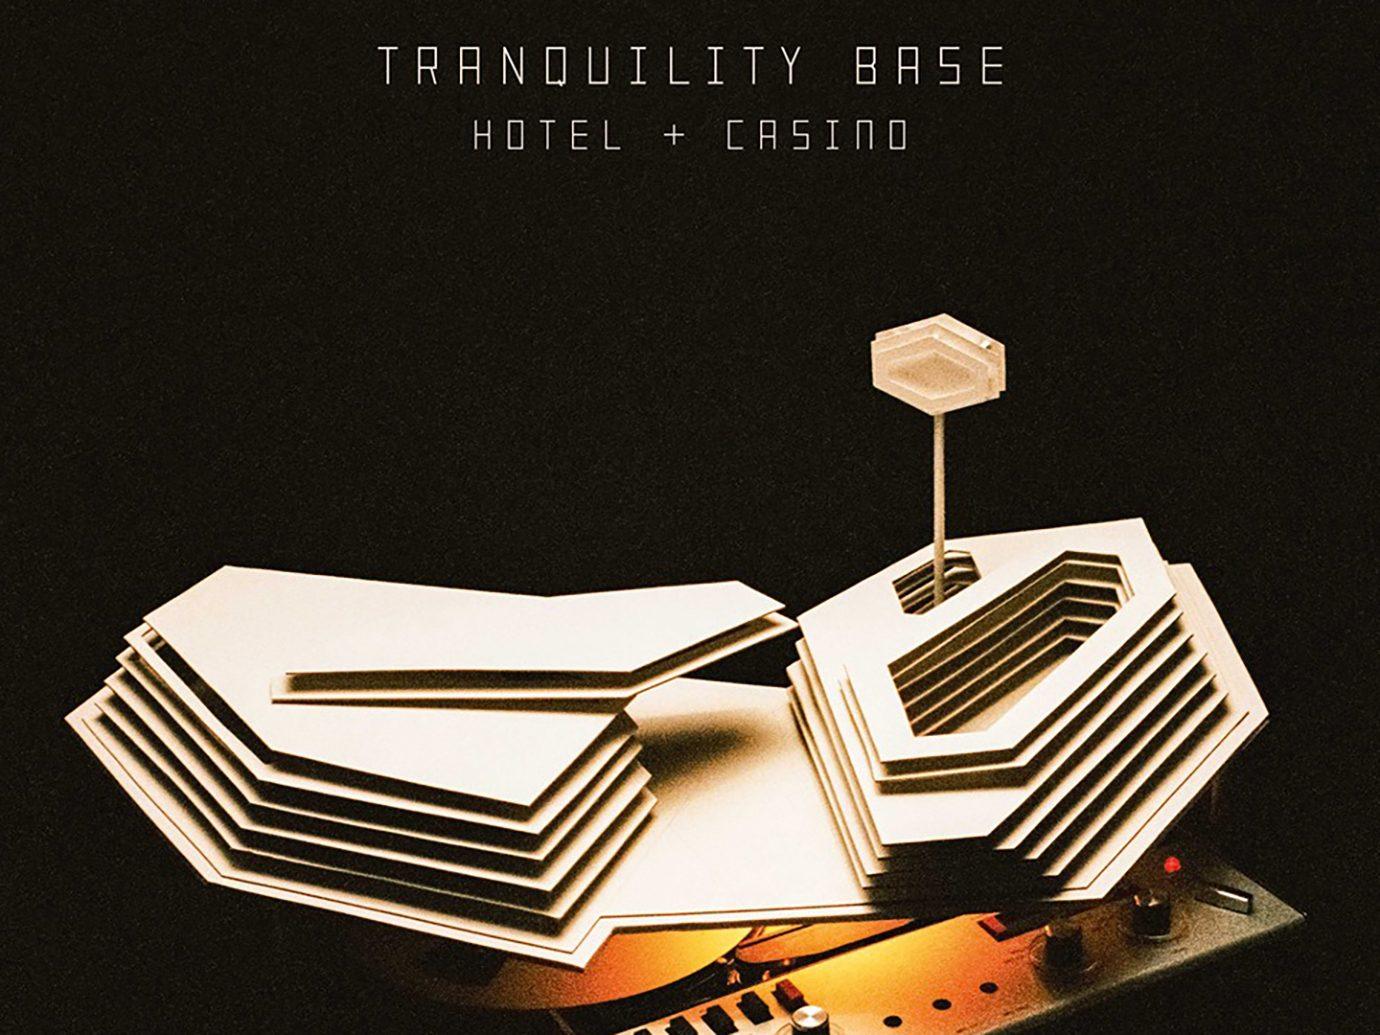 Leonardos Album des Jahres: Arctic Monkeys – Tranquility Base Hotel + Casino